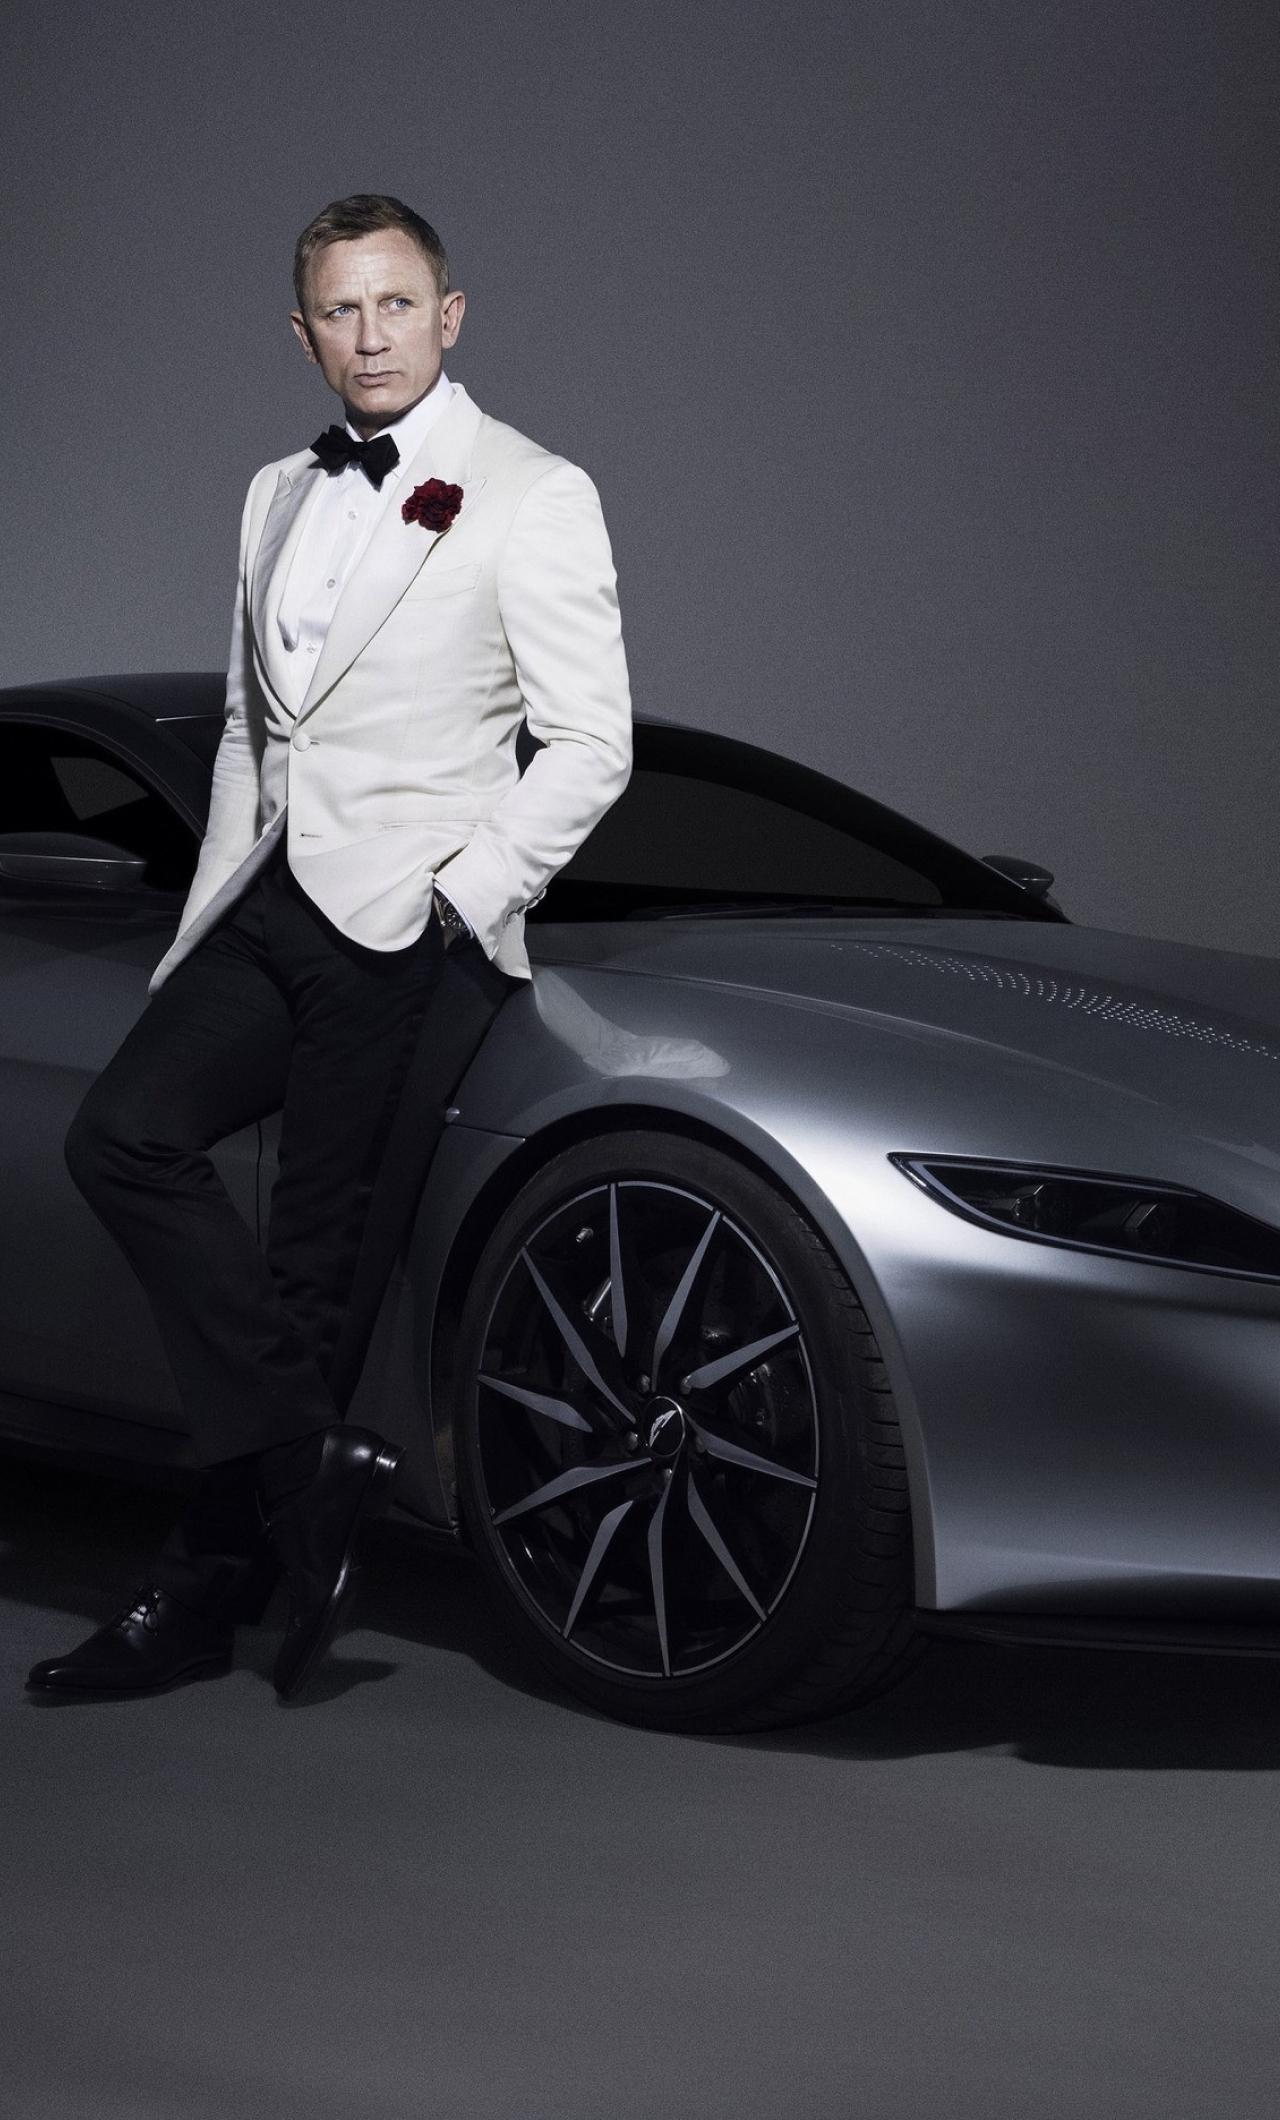 Daniel craig 007 james bond aston martin car photoshoot - 007 wallpaper 4k ...